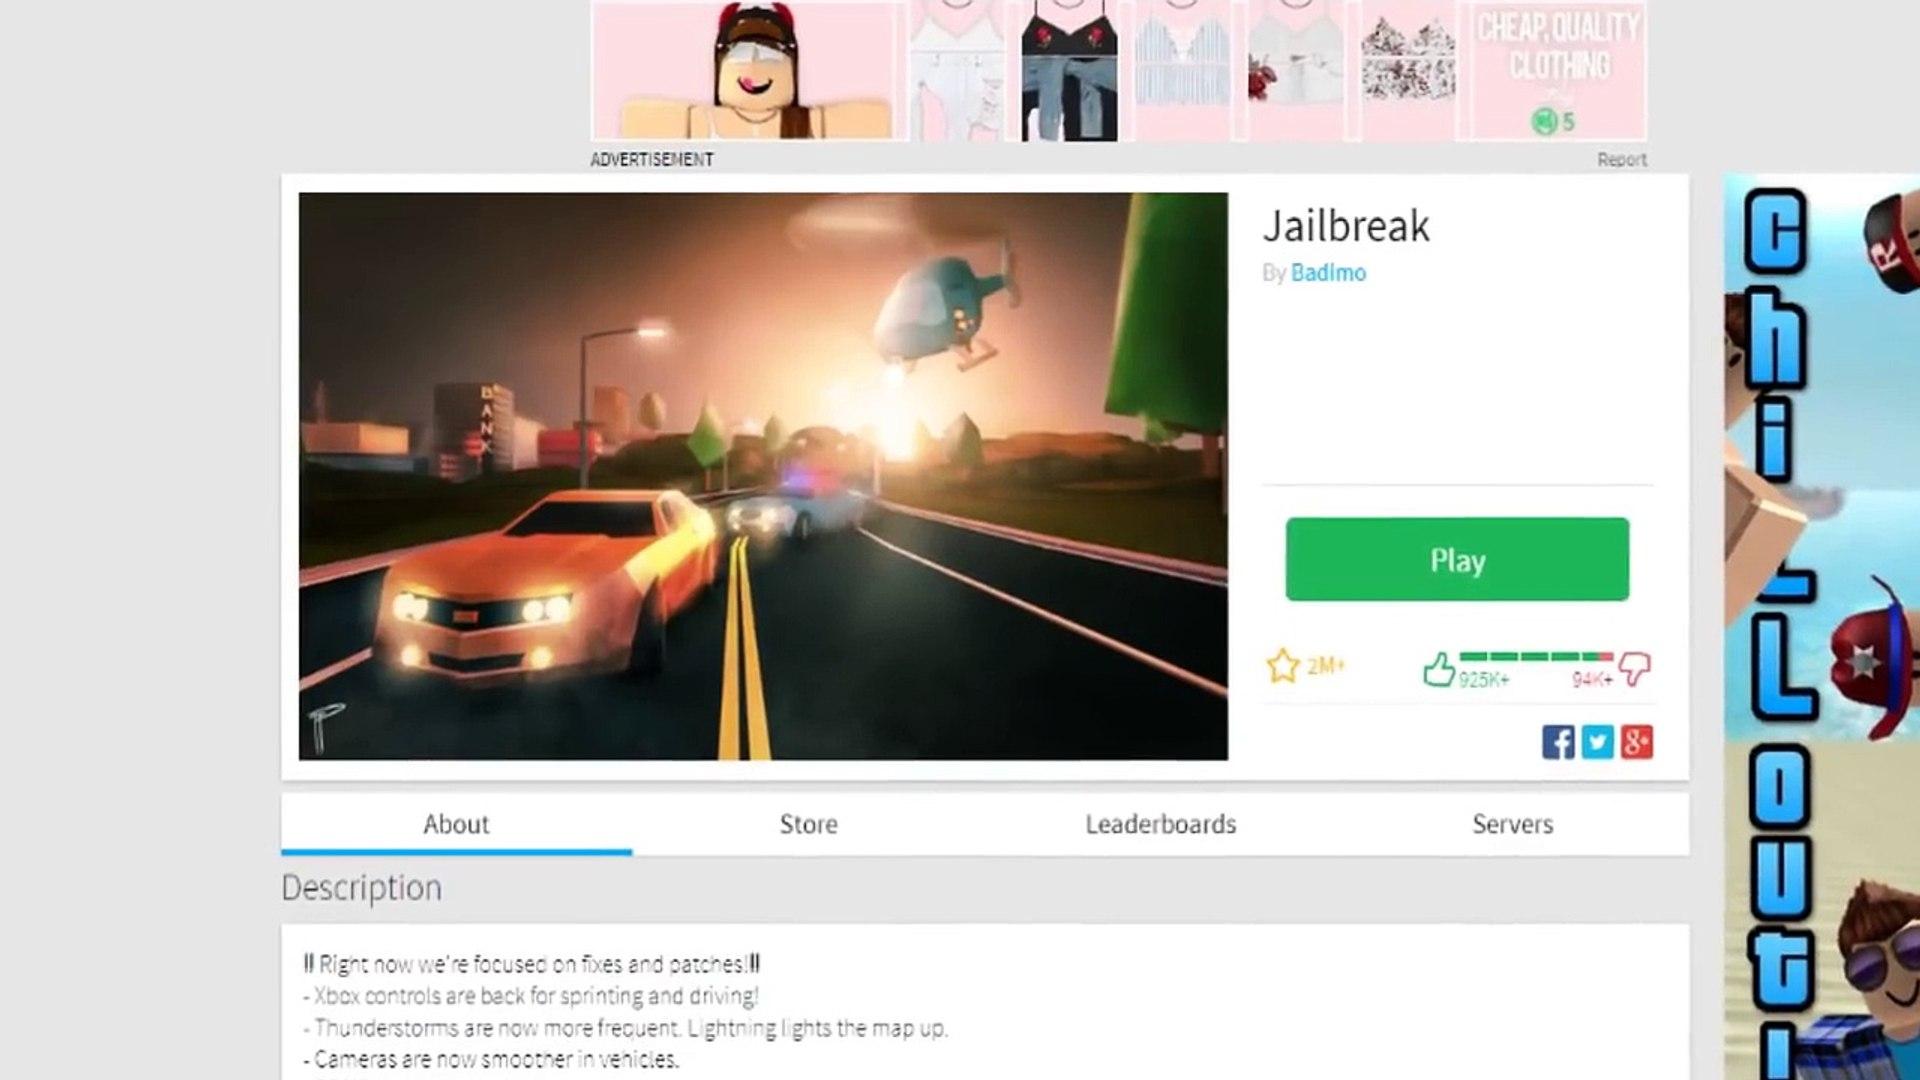 Roblox Jailbreak Op Speed Glitch Roblox 2 Player Superhero